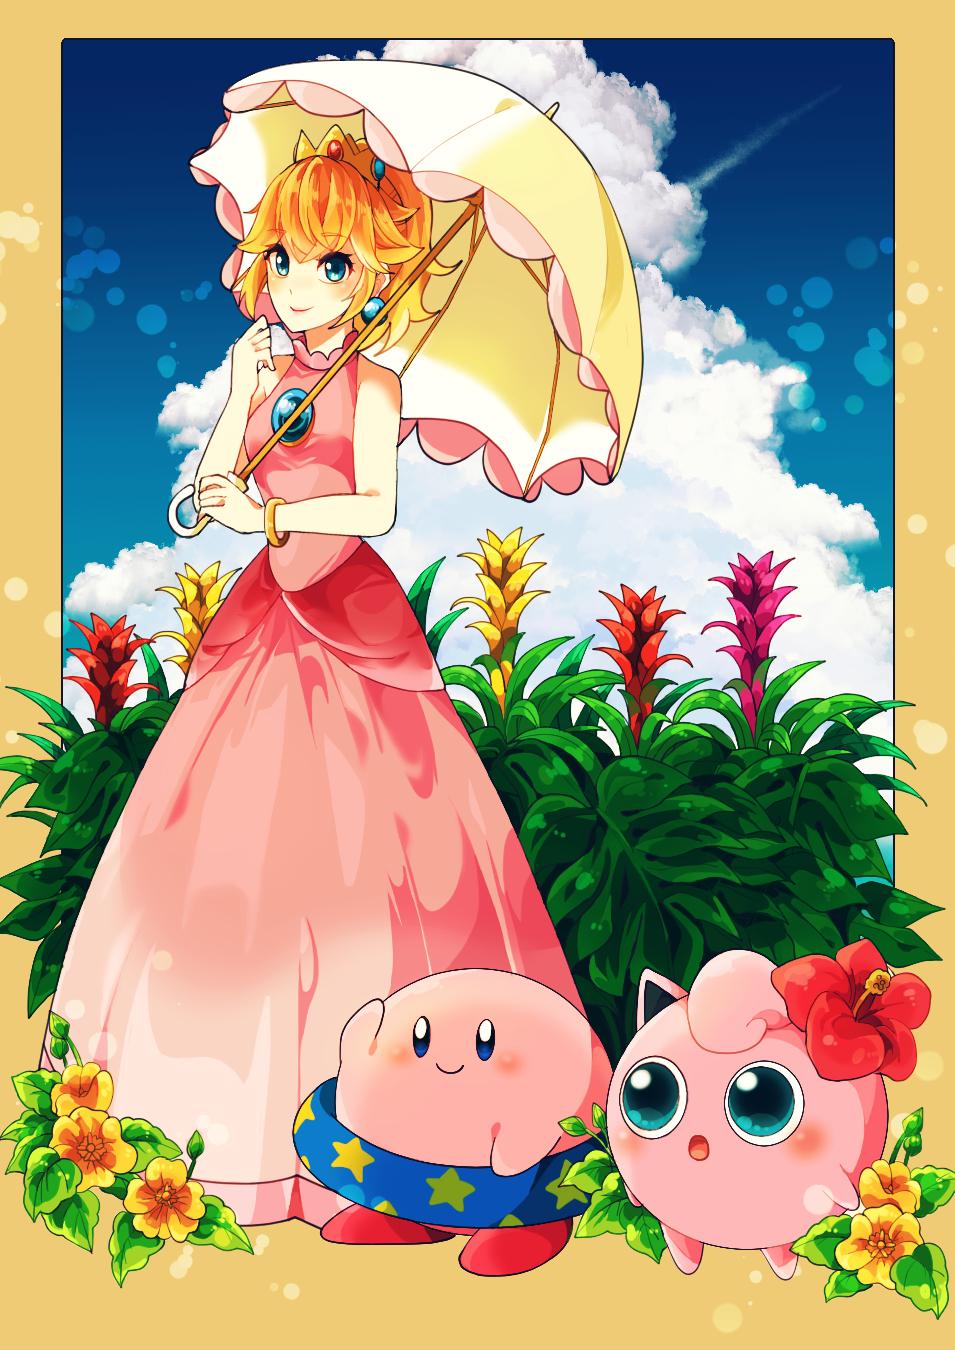 Super Smash Bros Mobile Wallpaper 2031731 Zerochan Anime Image